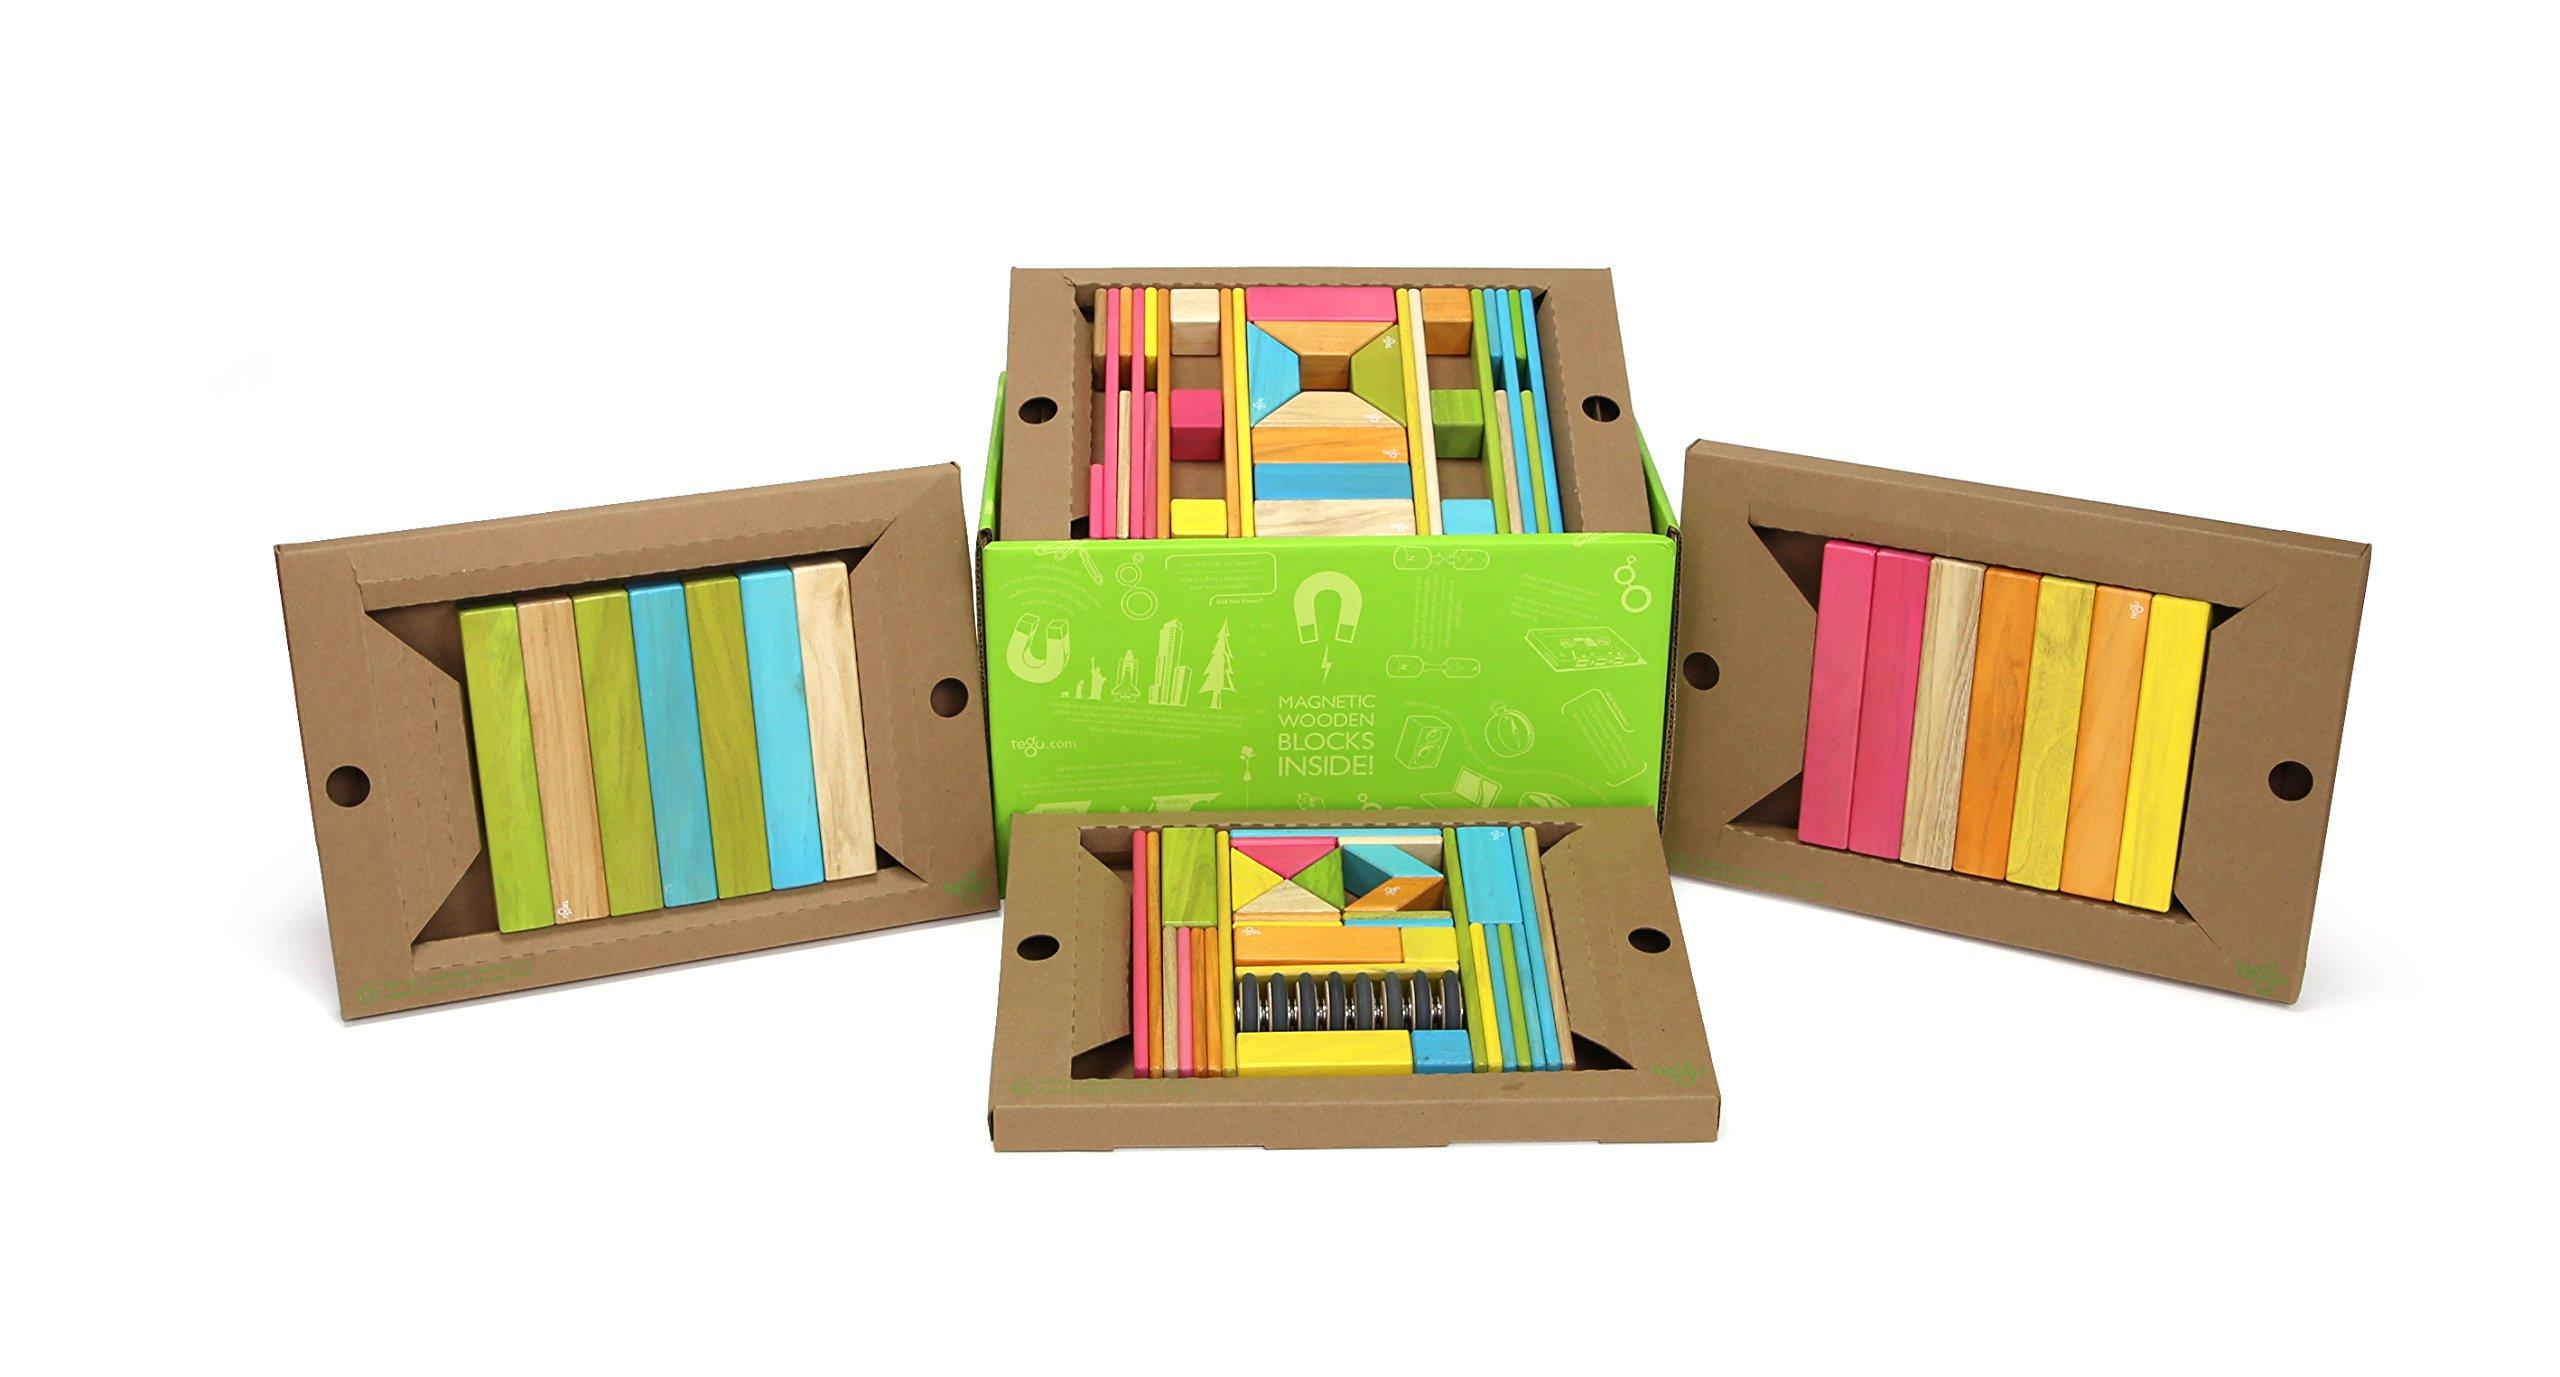 90 Piece Tegu Classroom Magnetic Wooden Block Set, Tints by Tegu (Image #1)